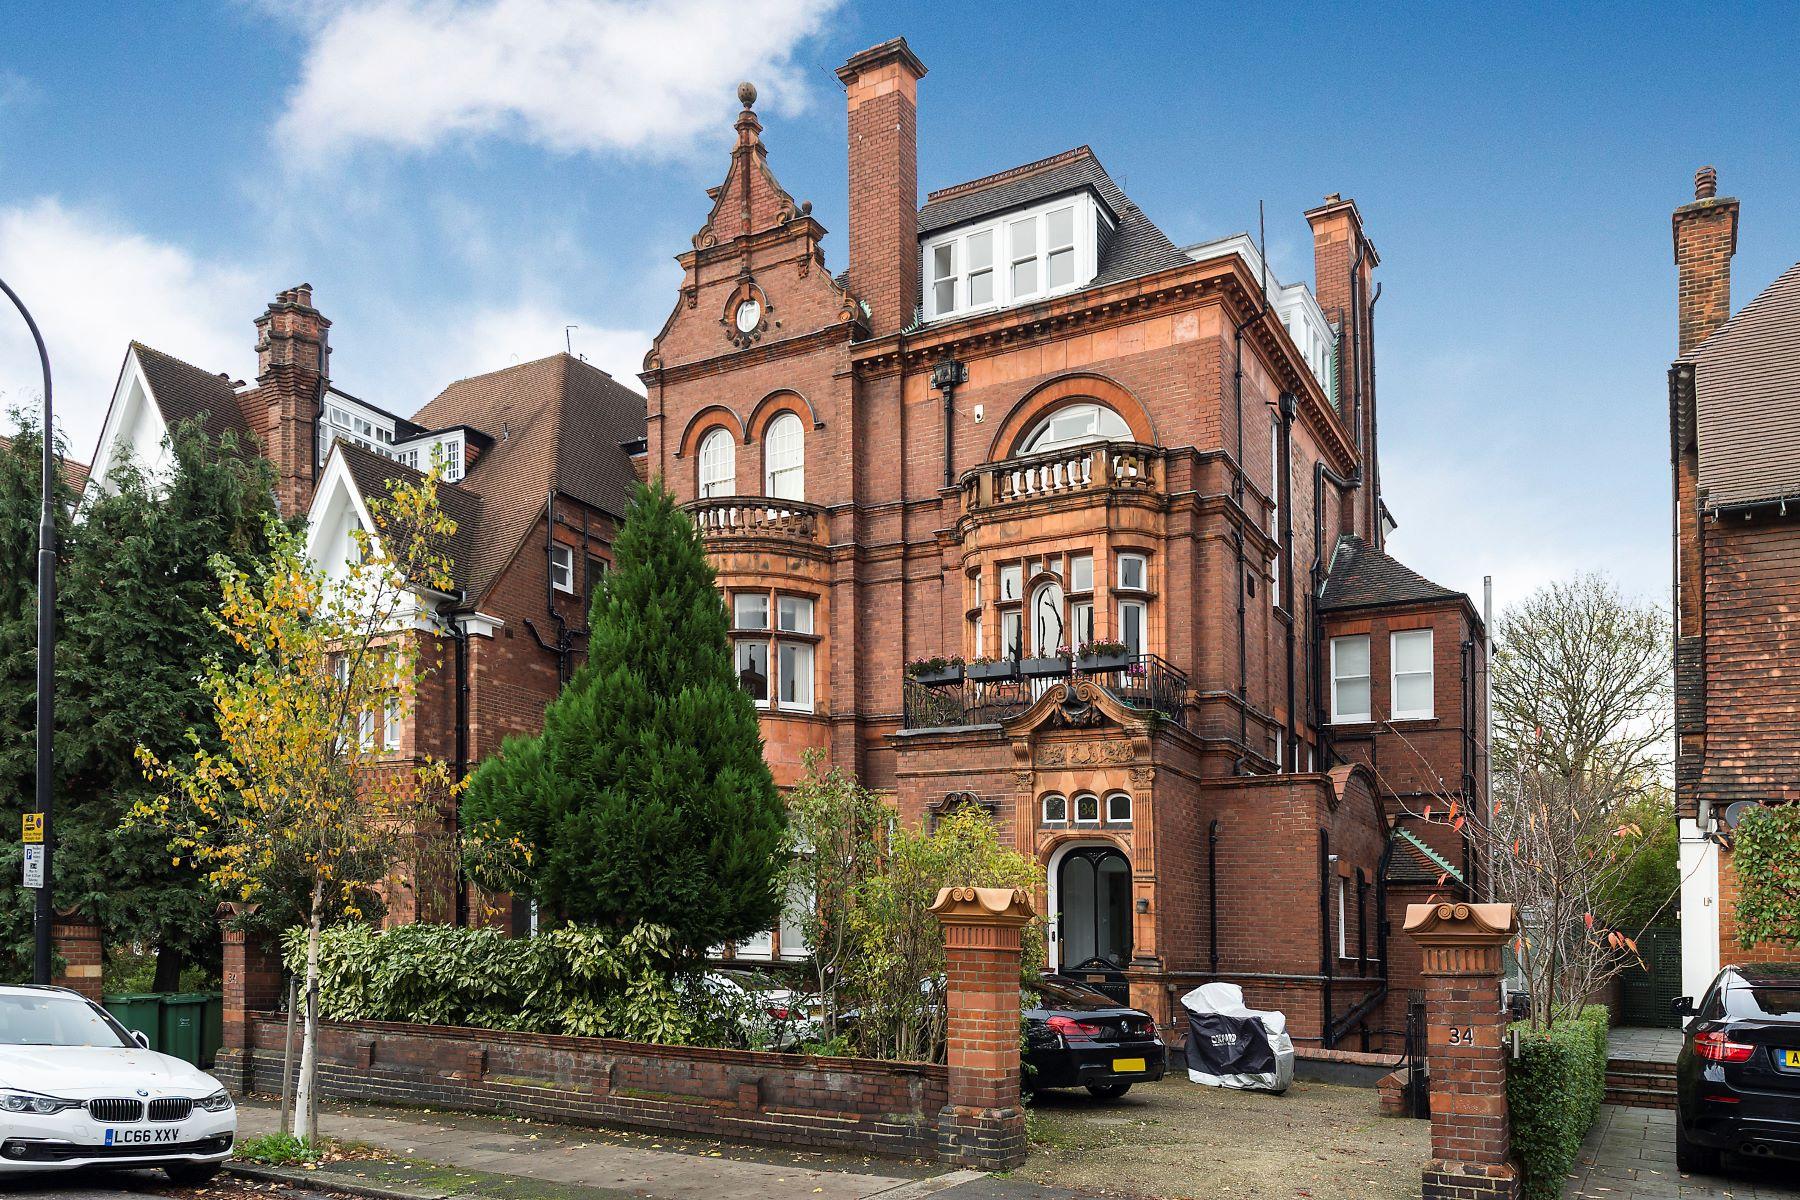 Property للـ Sale في Flat F 34 Eton Avenue London, England NW3 3HL United Kingdom